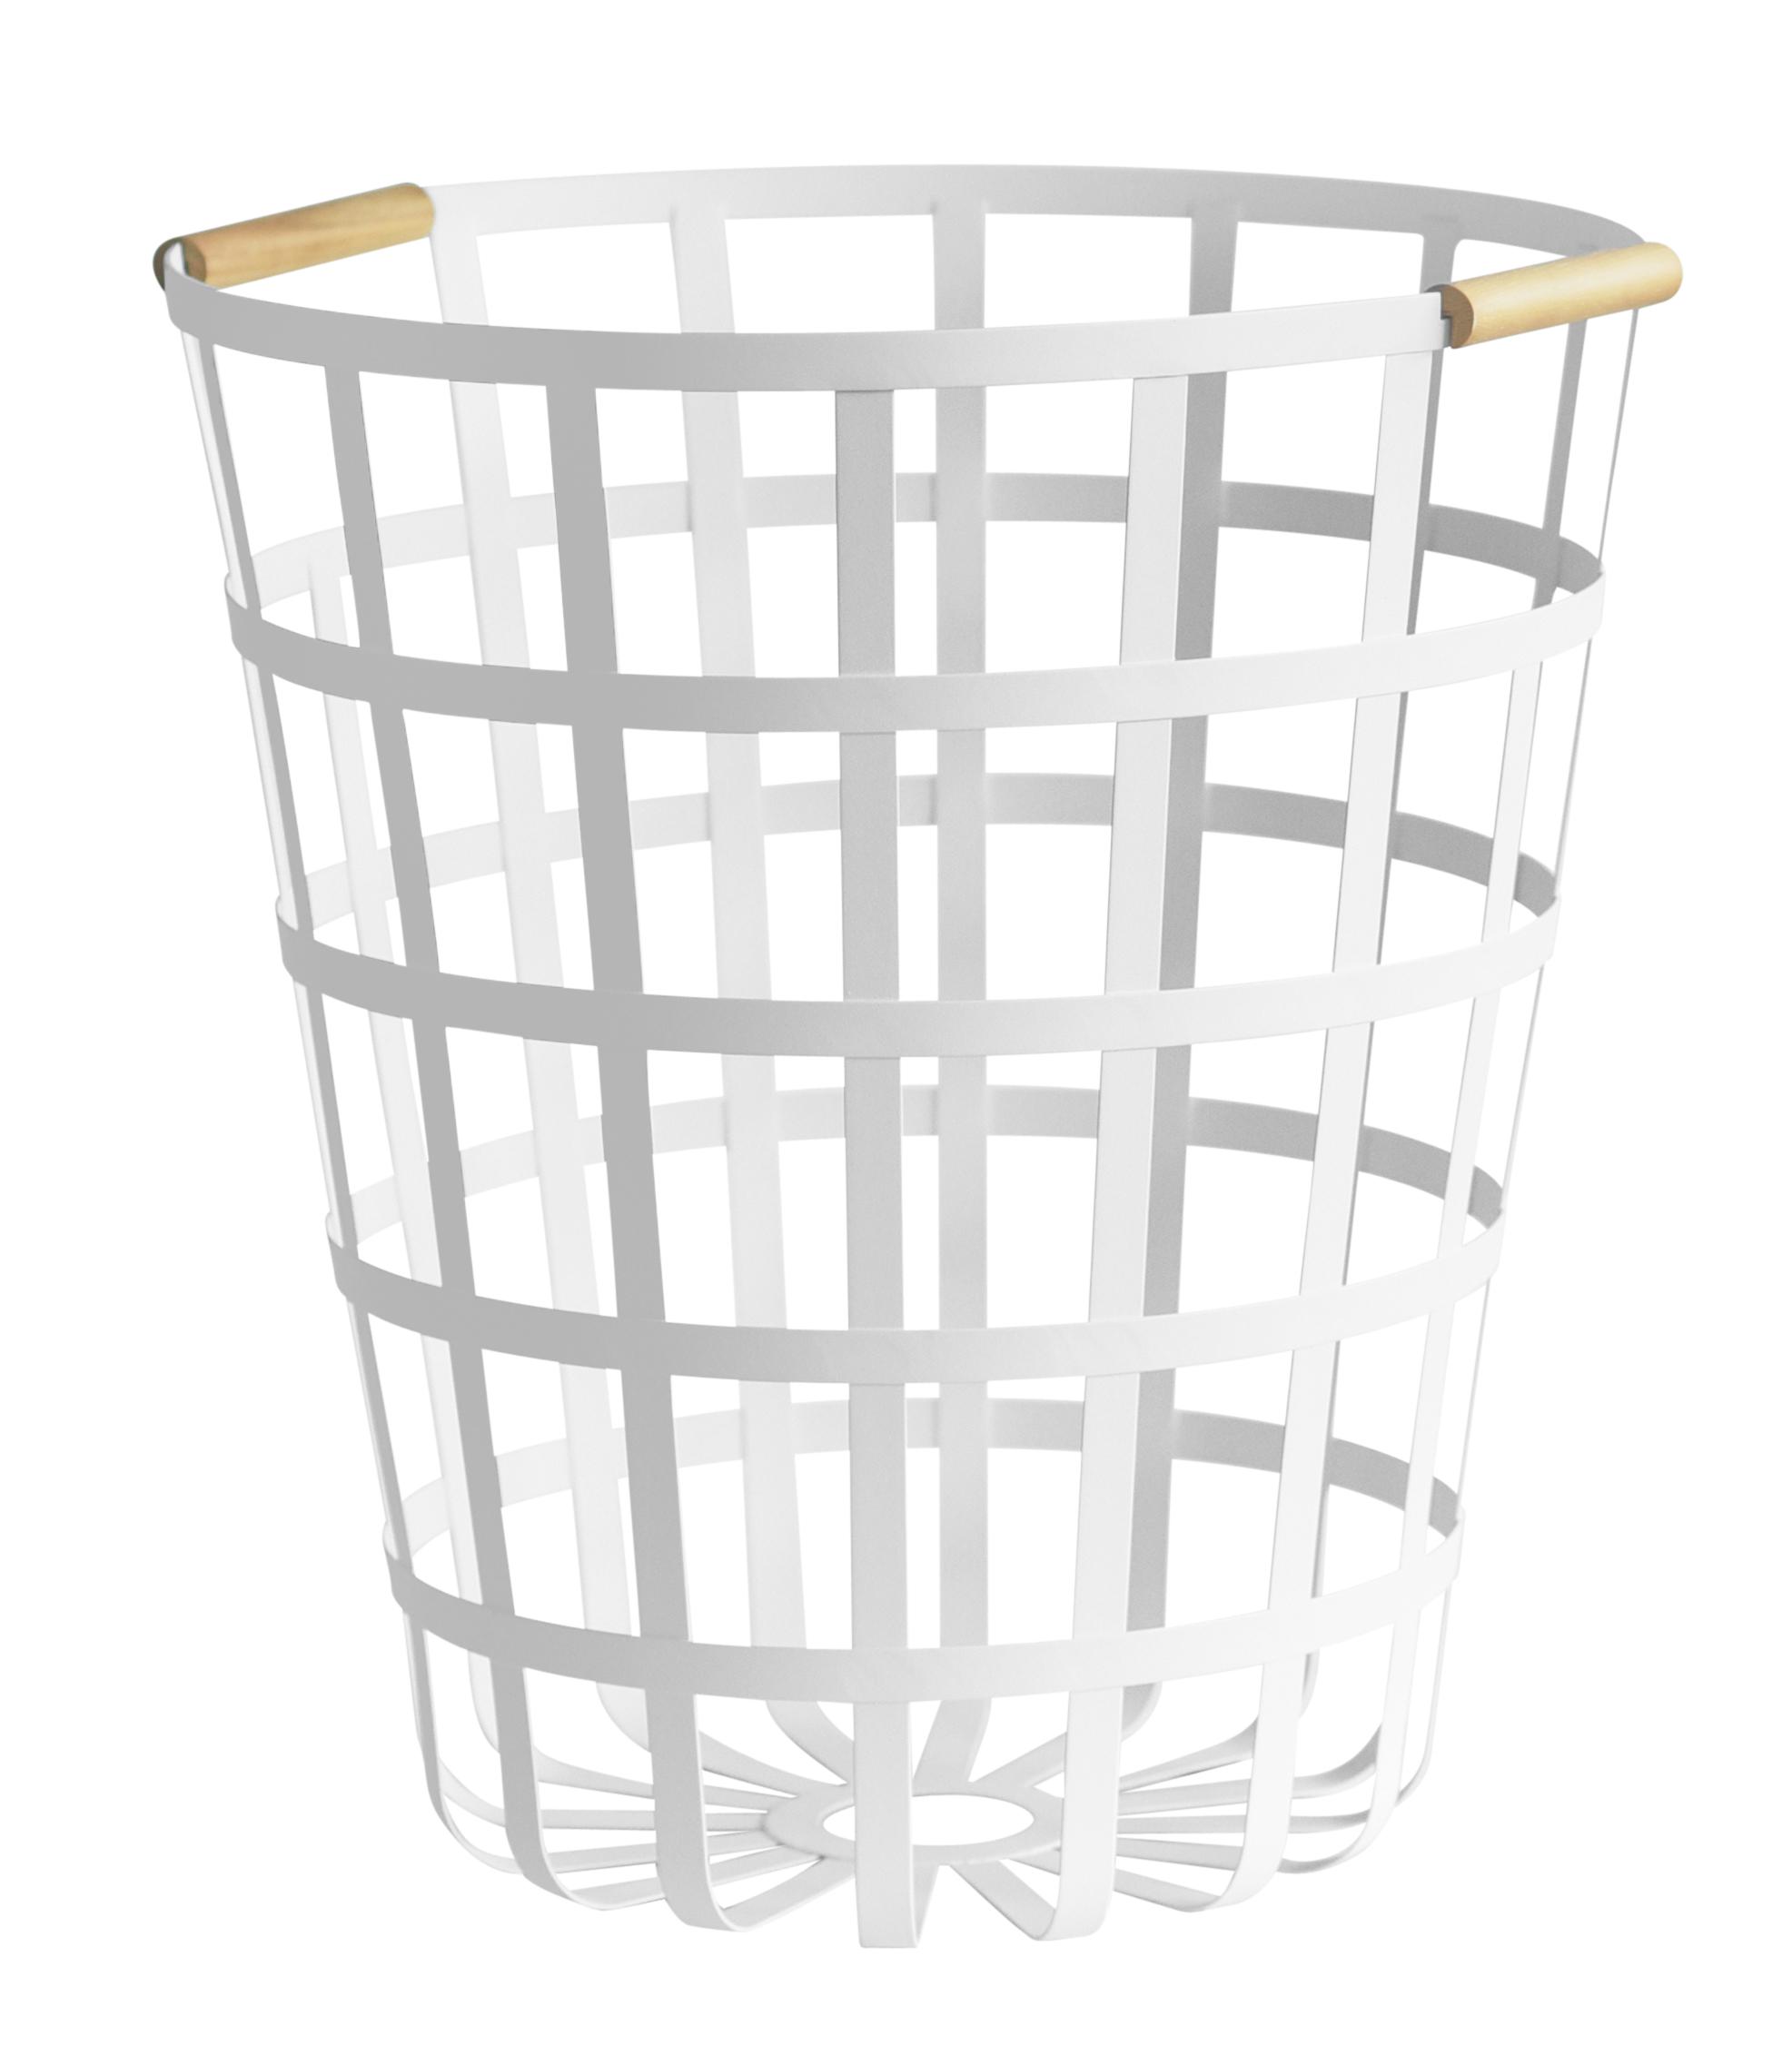 FR_LAU_BEST-ABROAD tosca laundry basket round.jpg